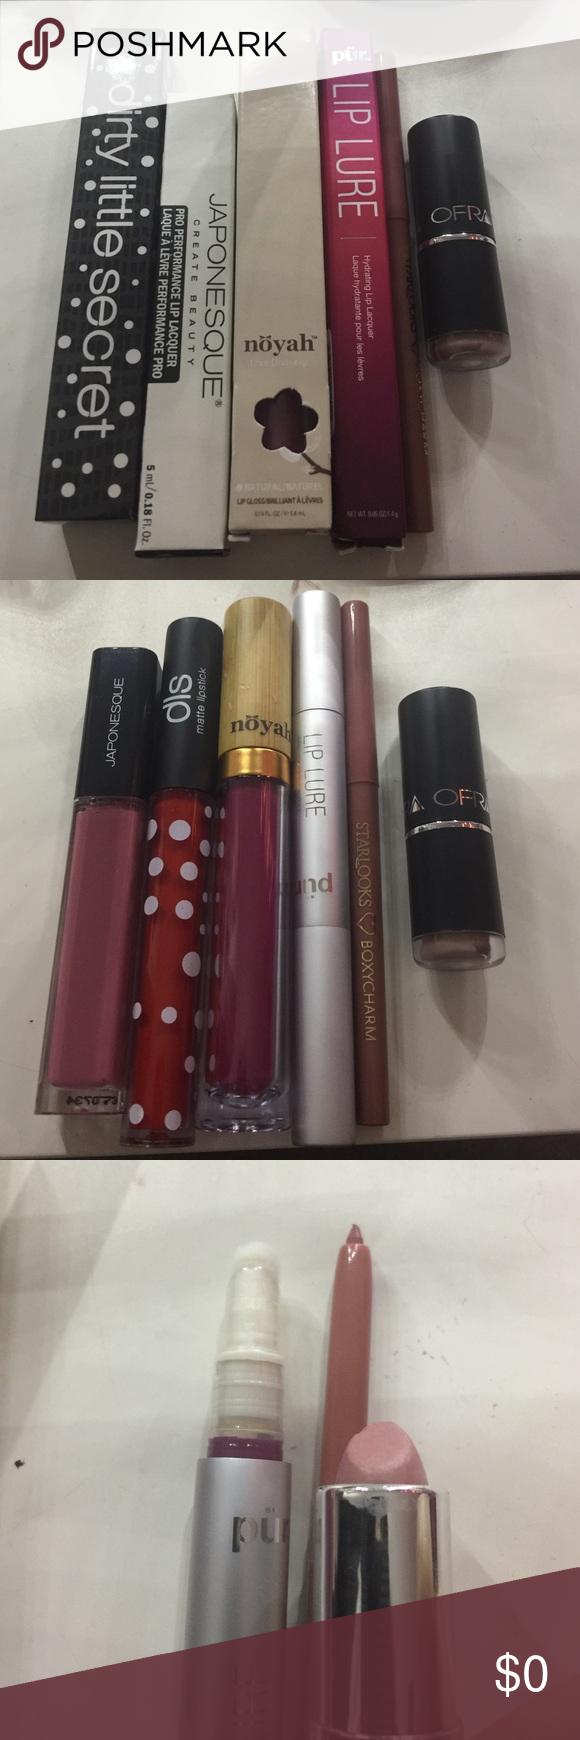 6 lip products! Lip gloss, matte liquid lipstick + (20